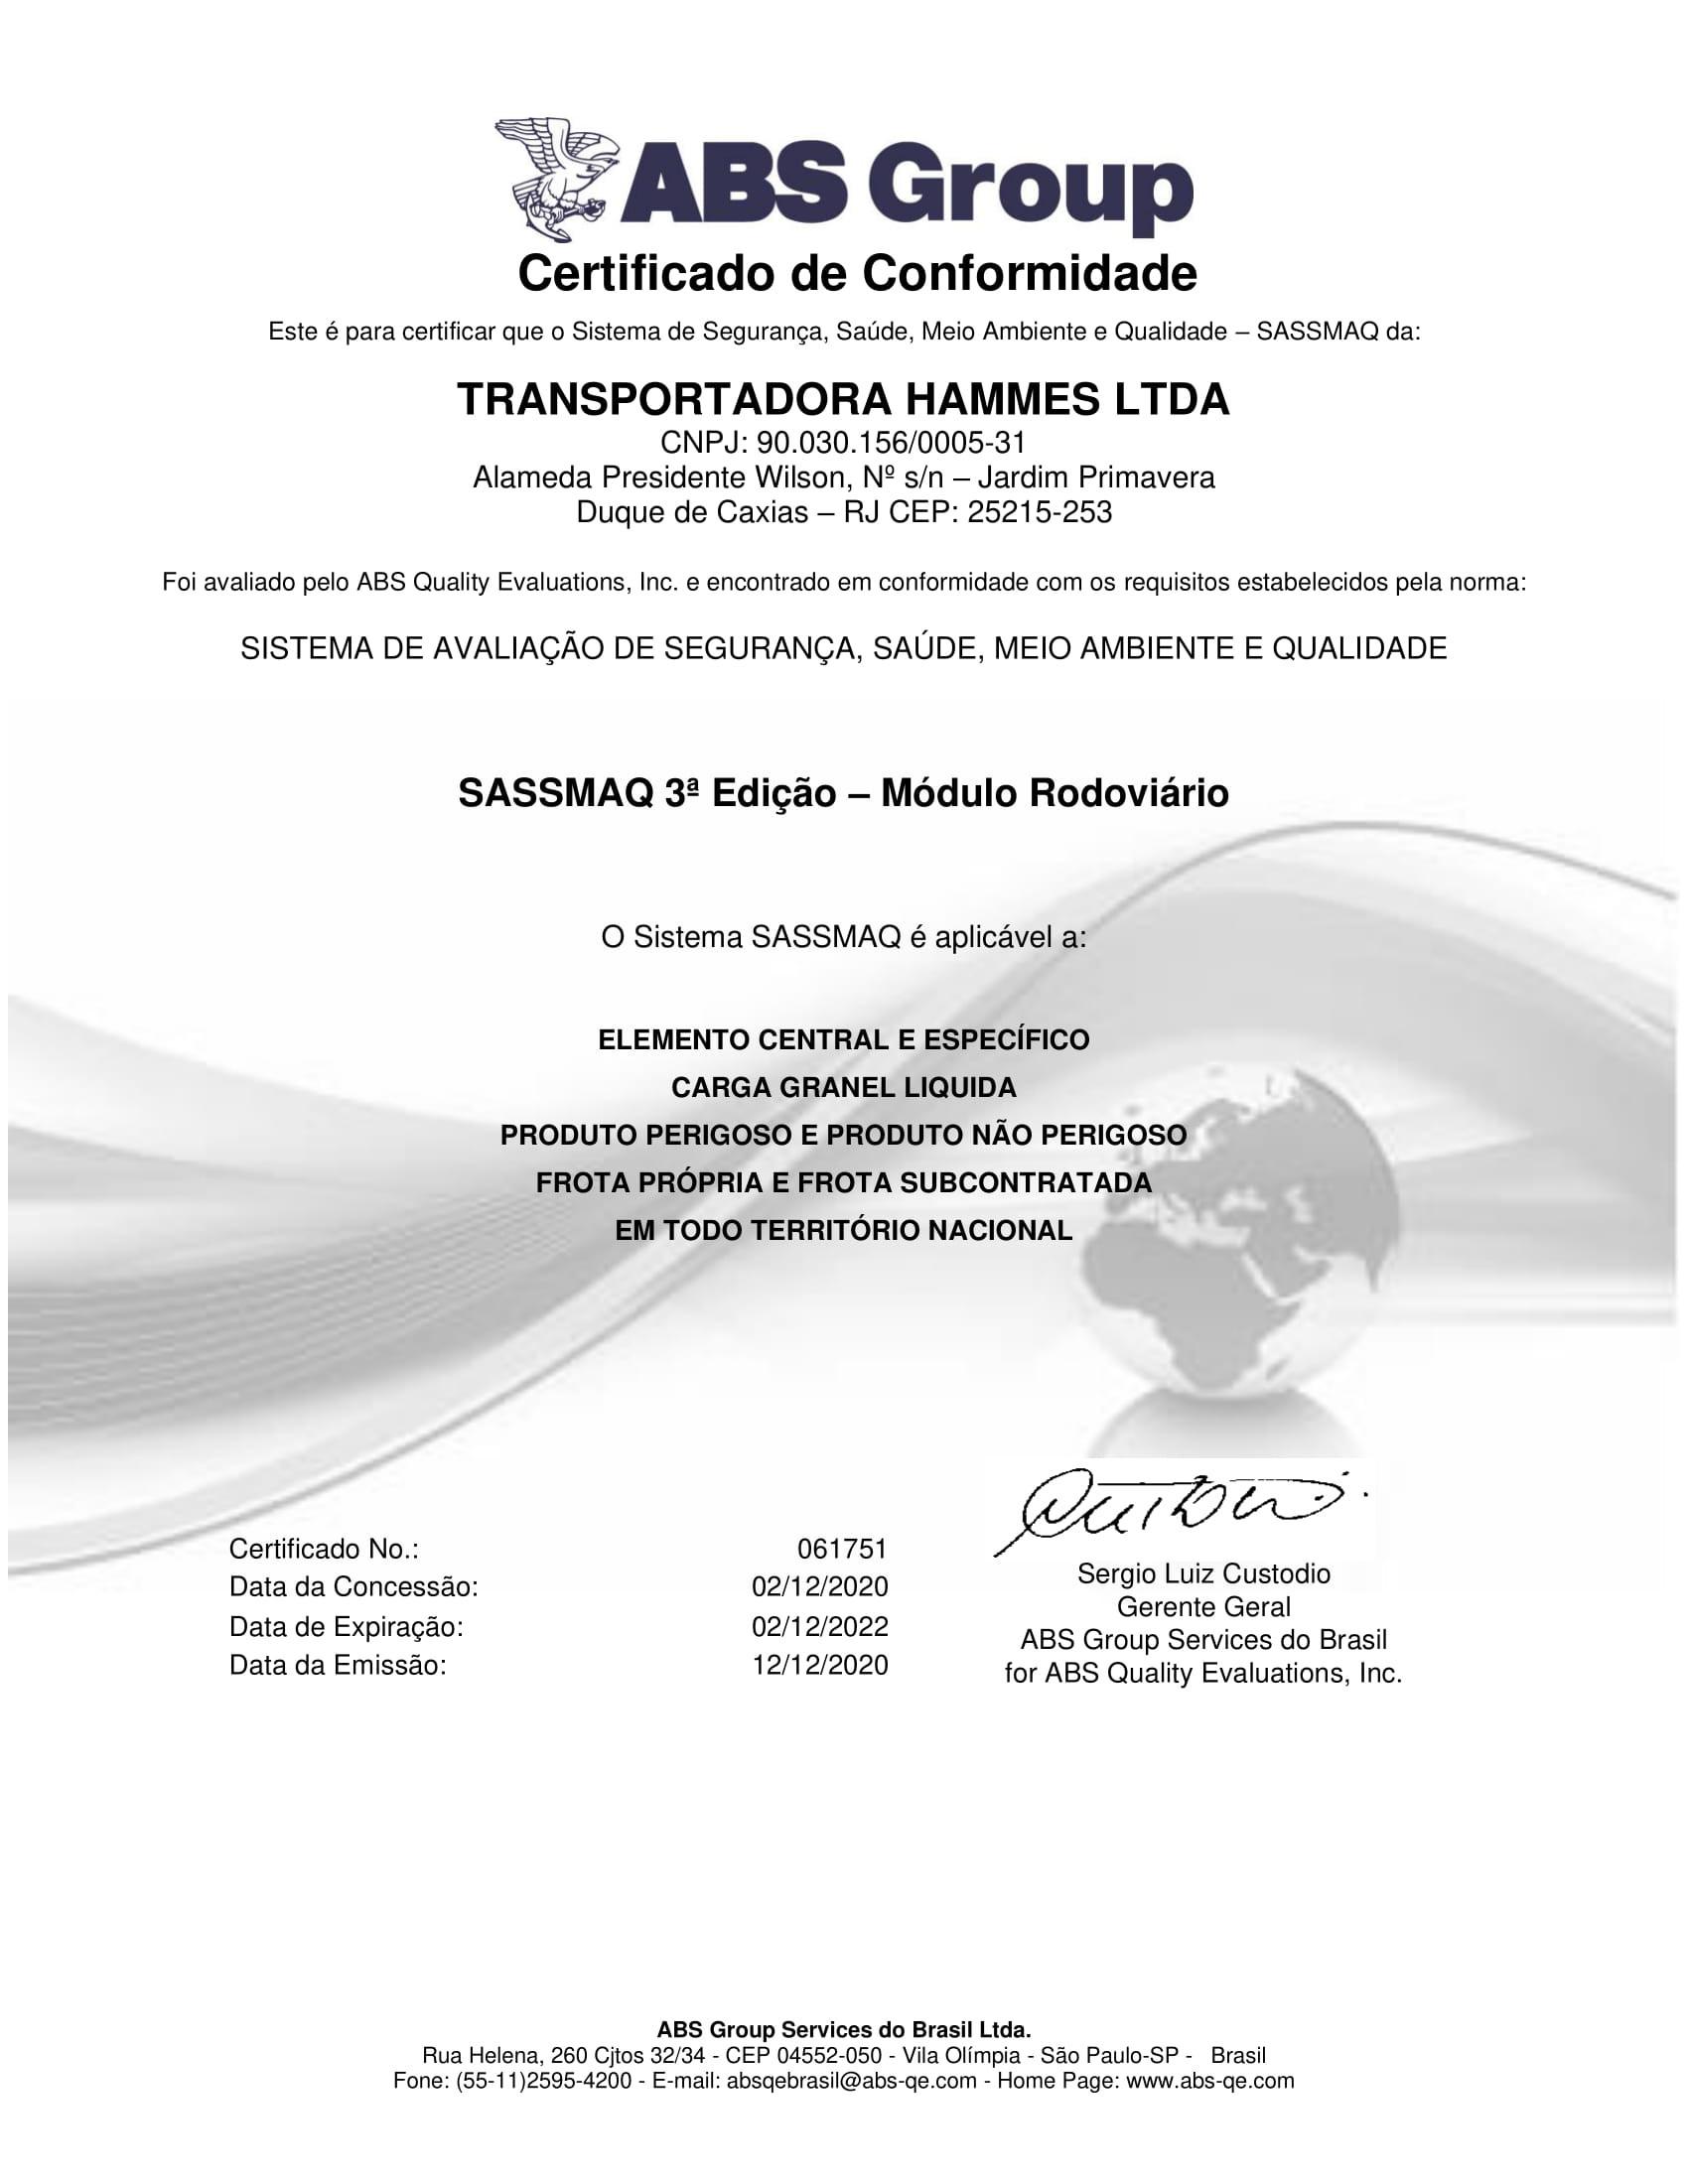 061751-Certificate-12DEC2020-Duque de Ca